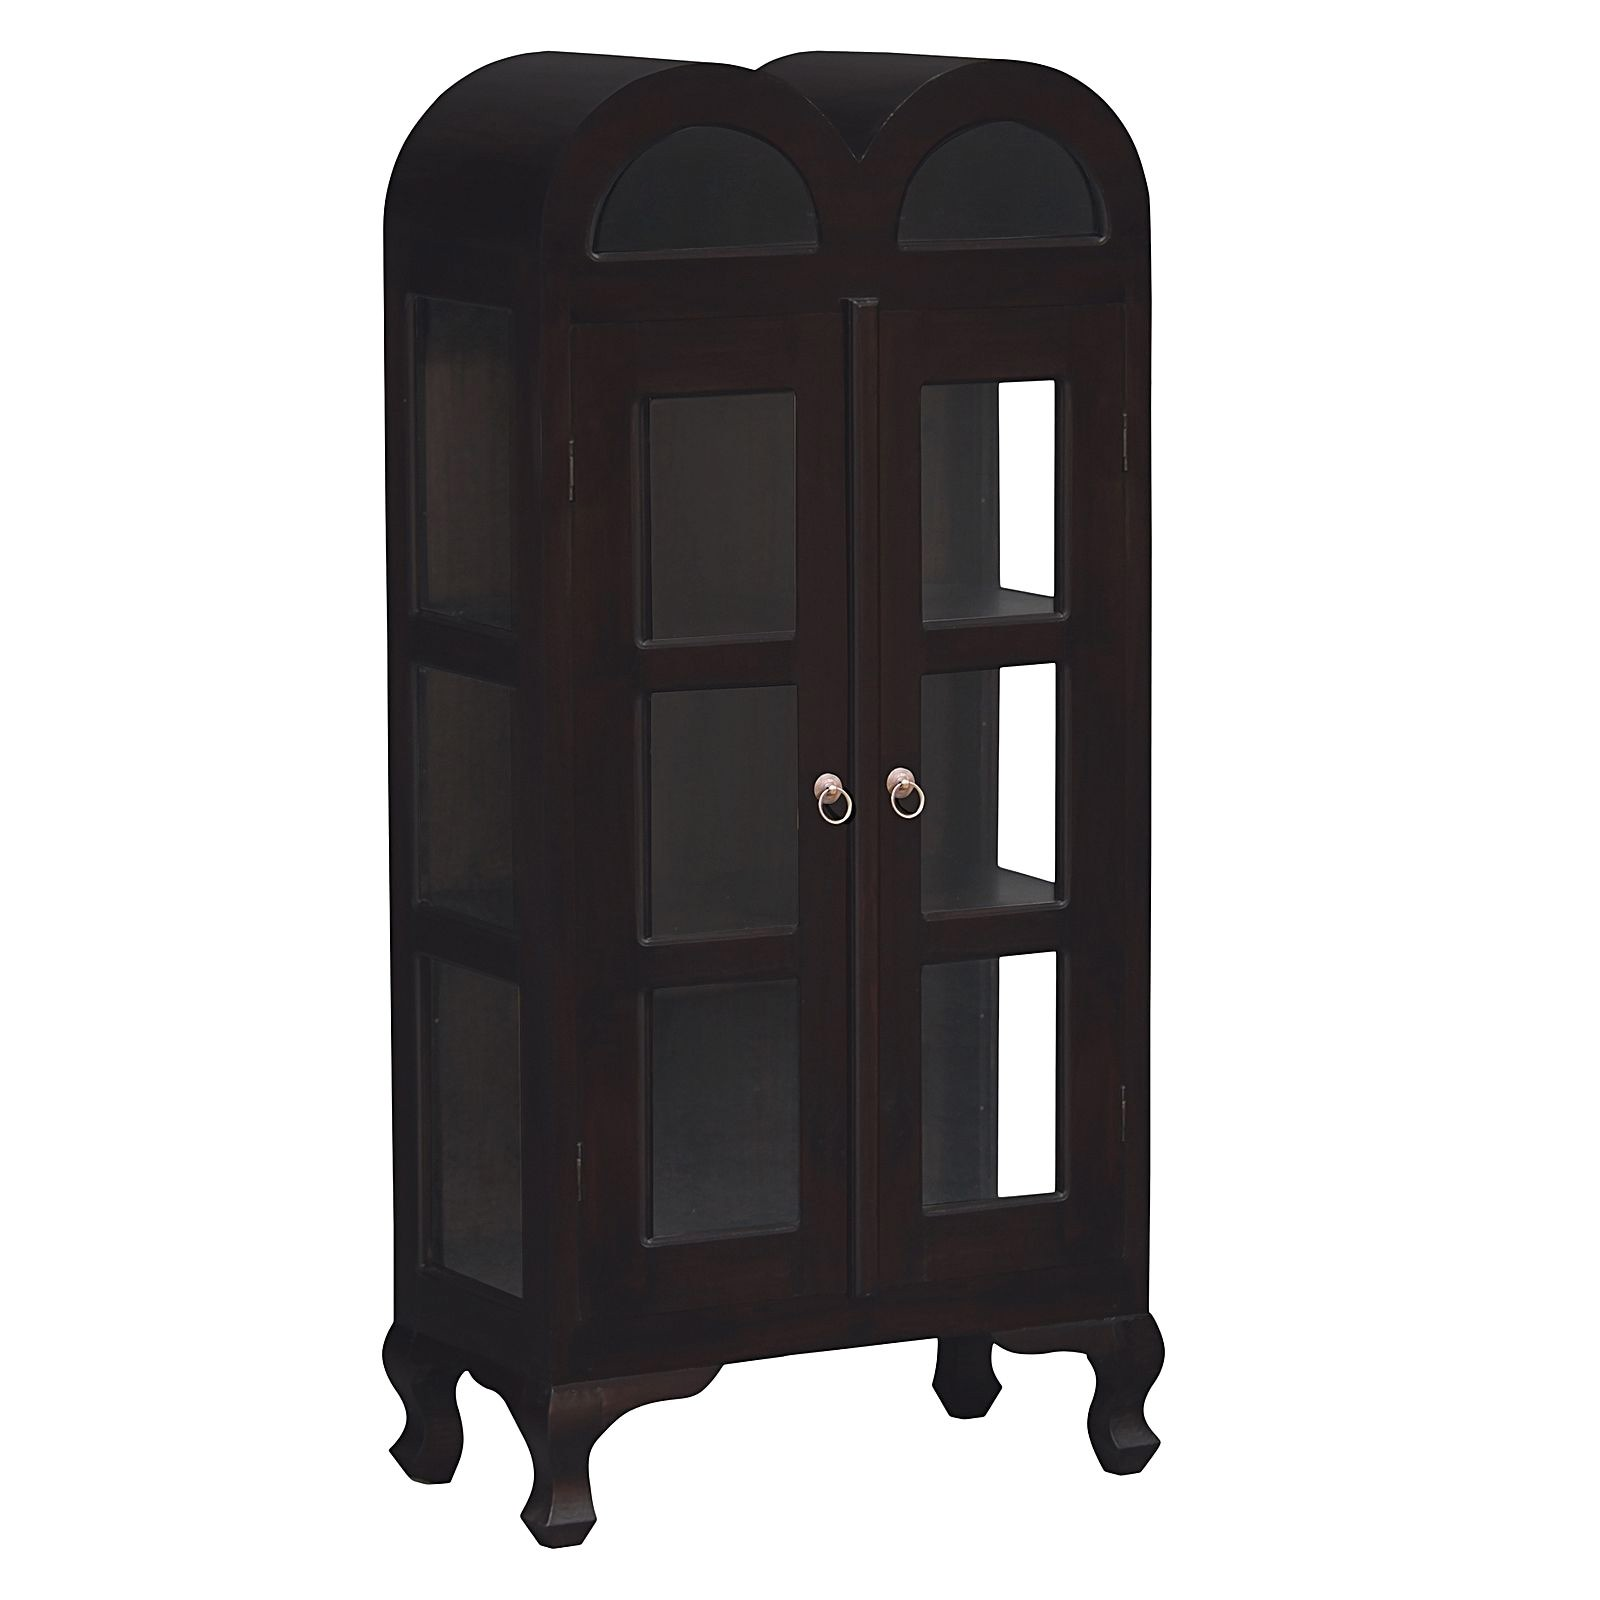 Gaidar Mahogany Timber Double Door Display Cabinet, Small, Chocolate